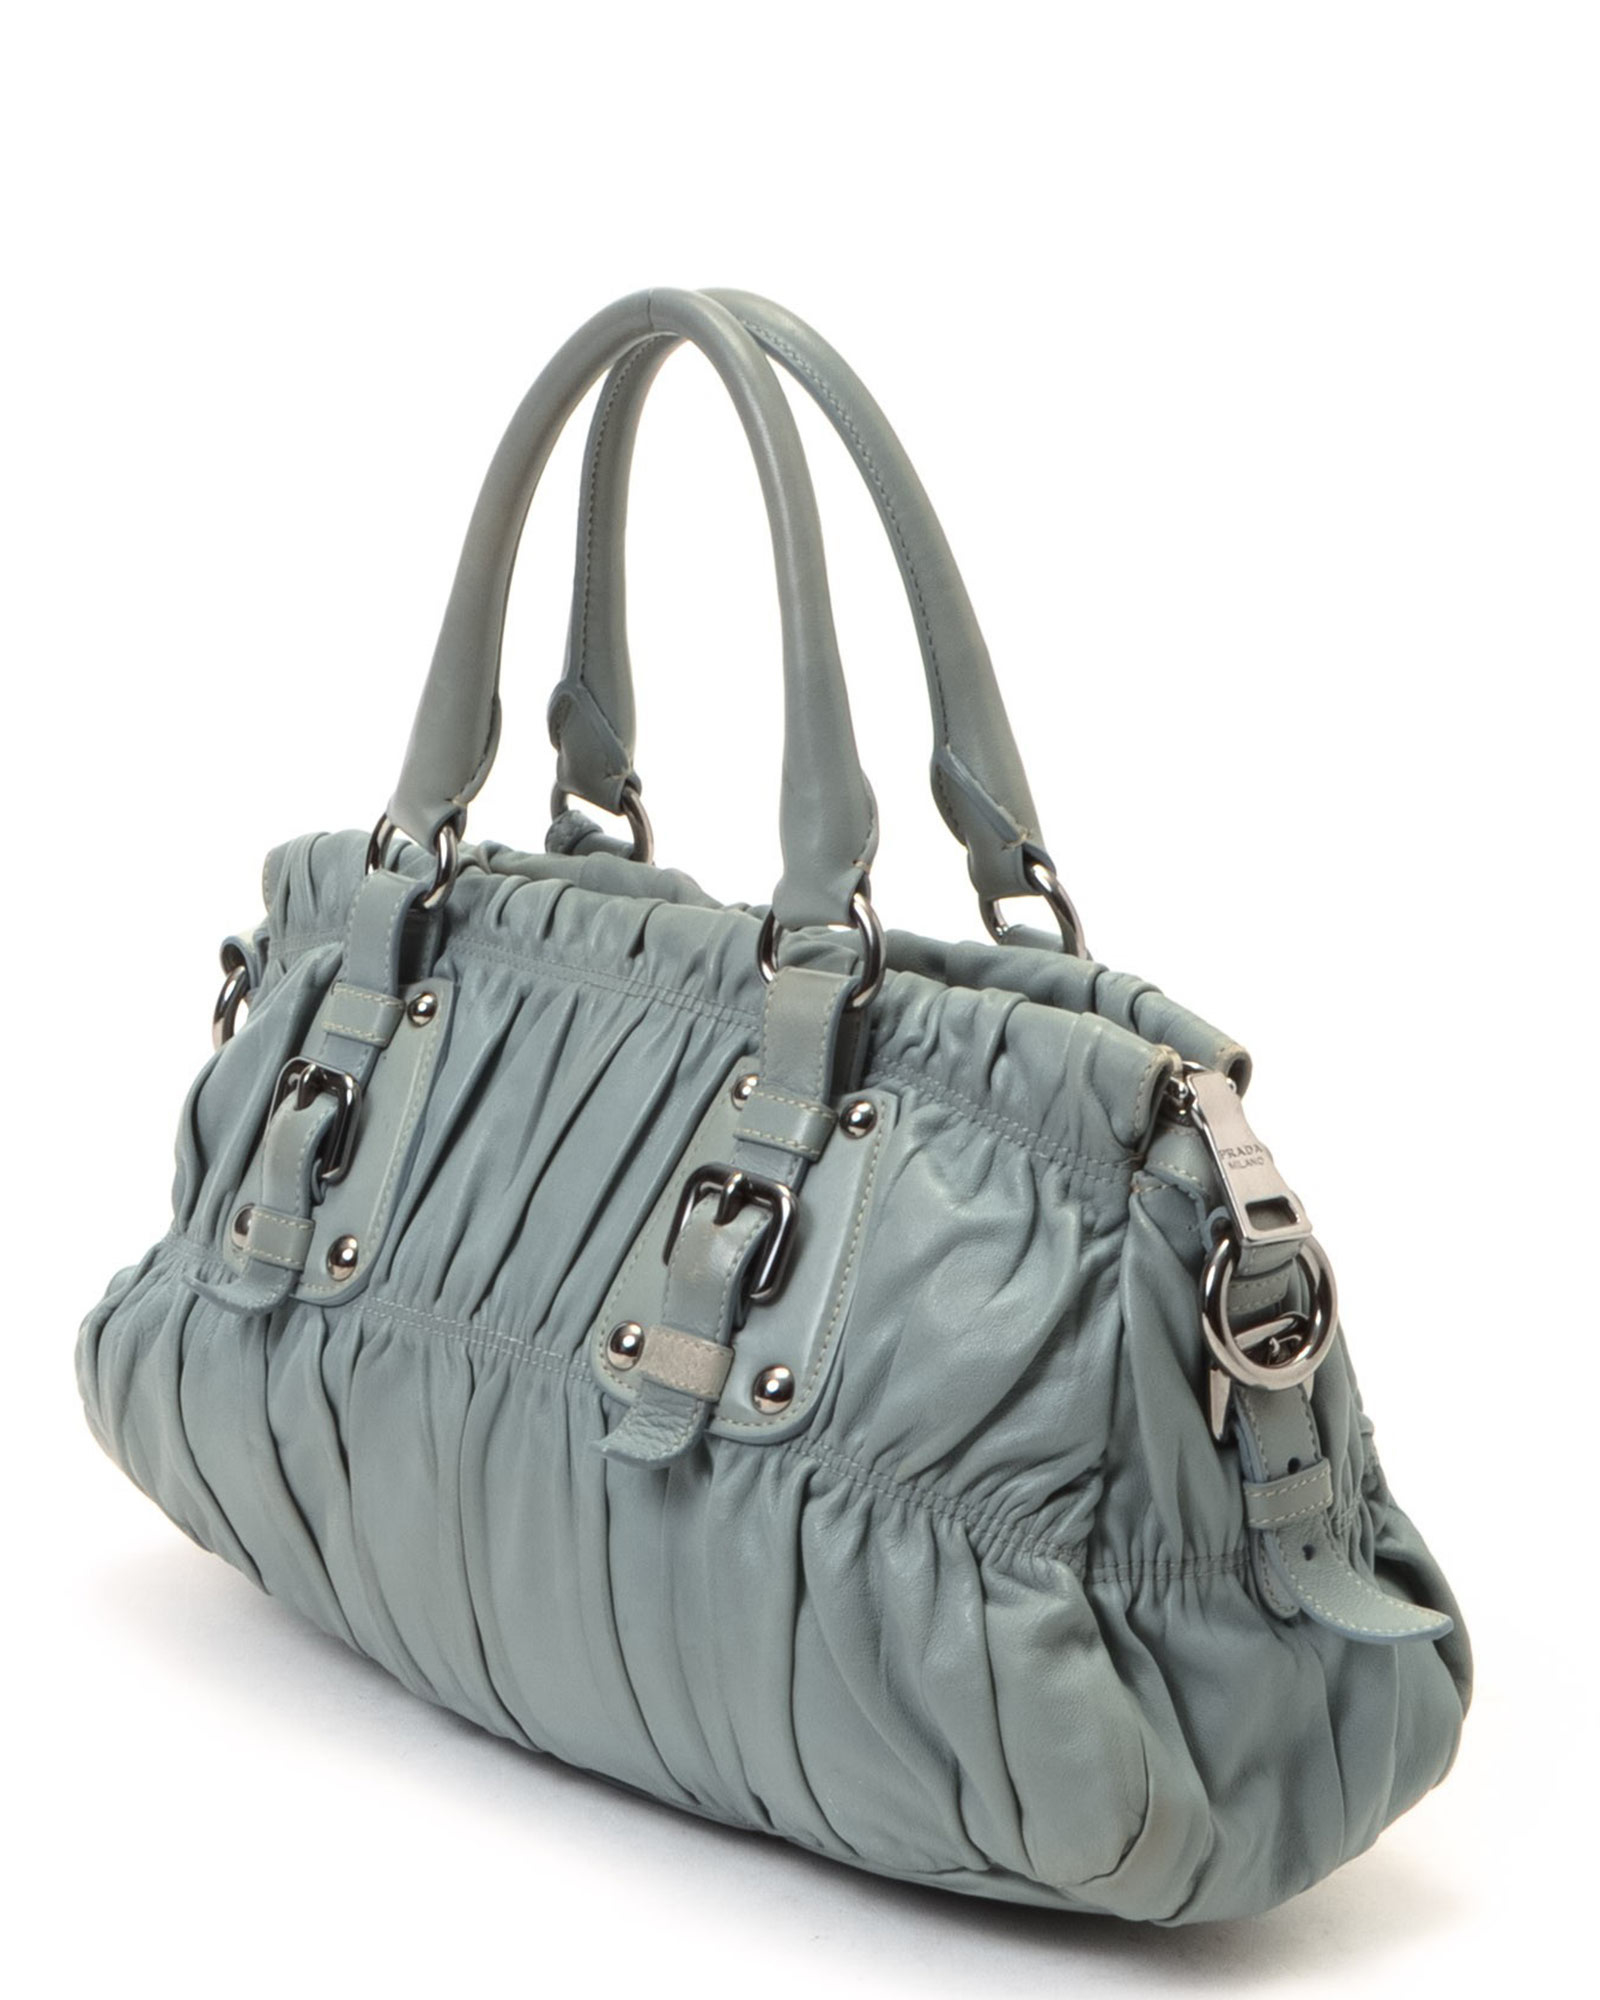 prada frame bag marble gray